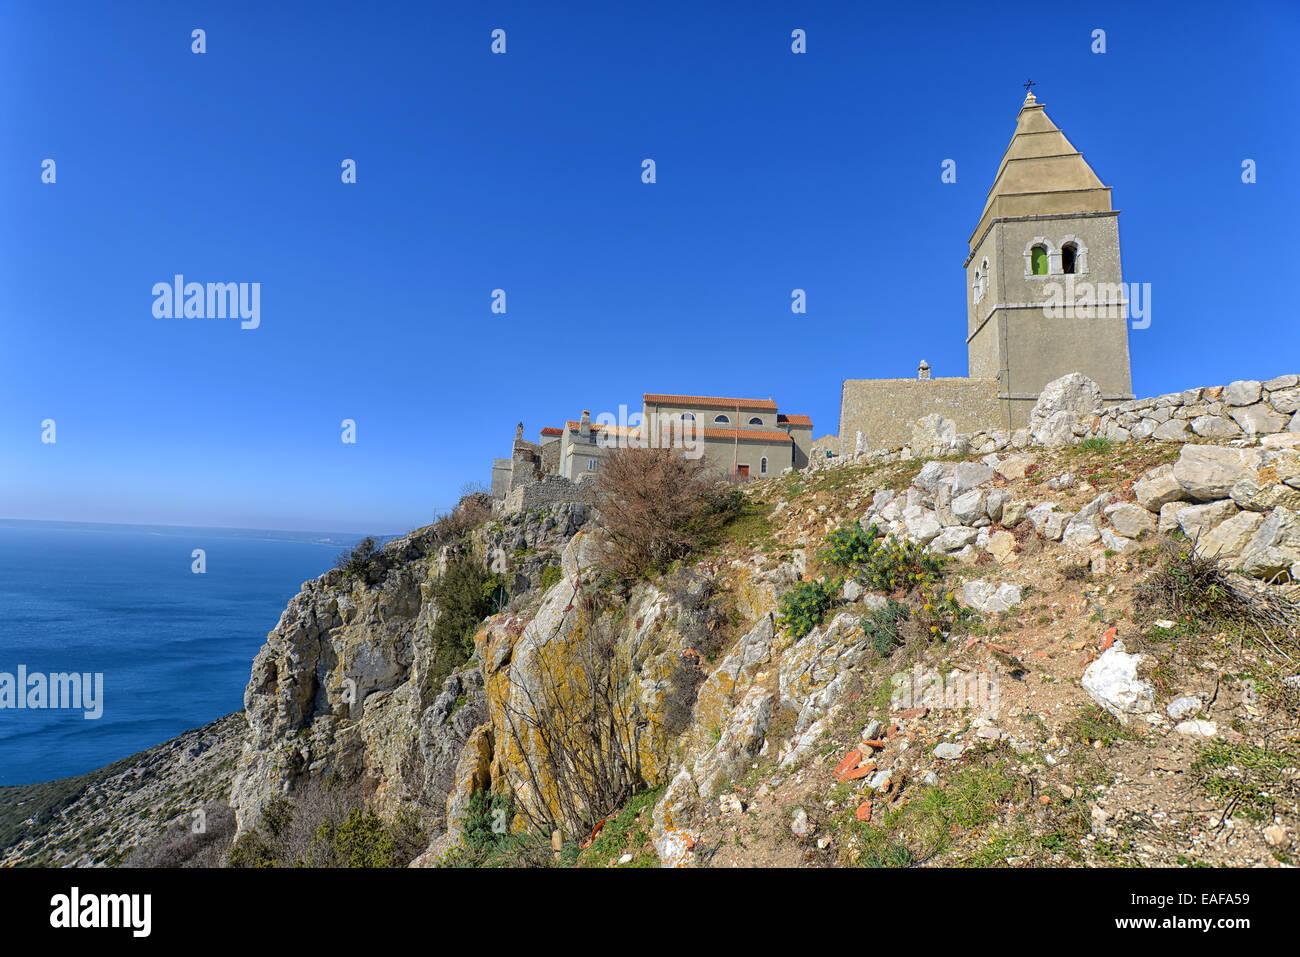 Ancient Fort City Lubenice, Croatia Stock Photo